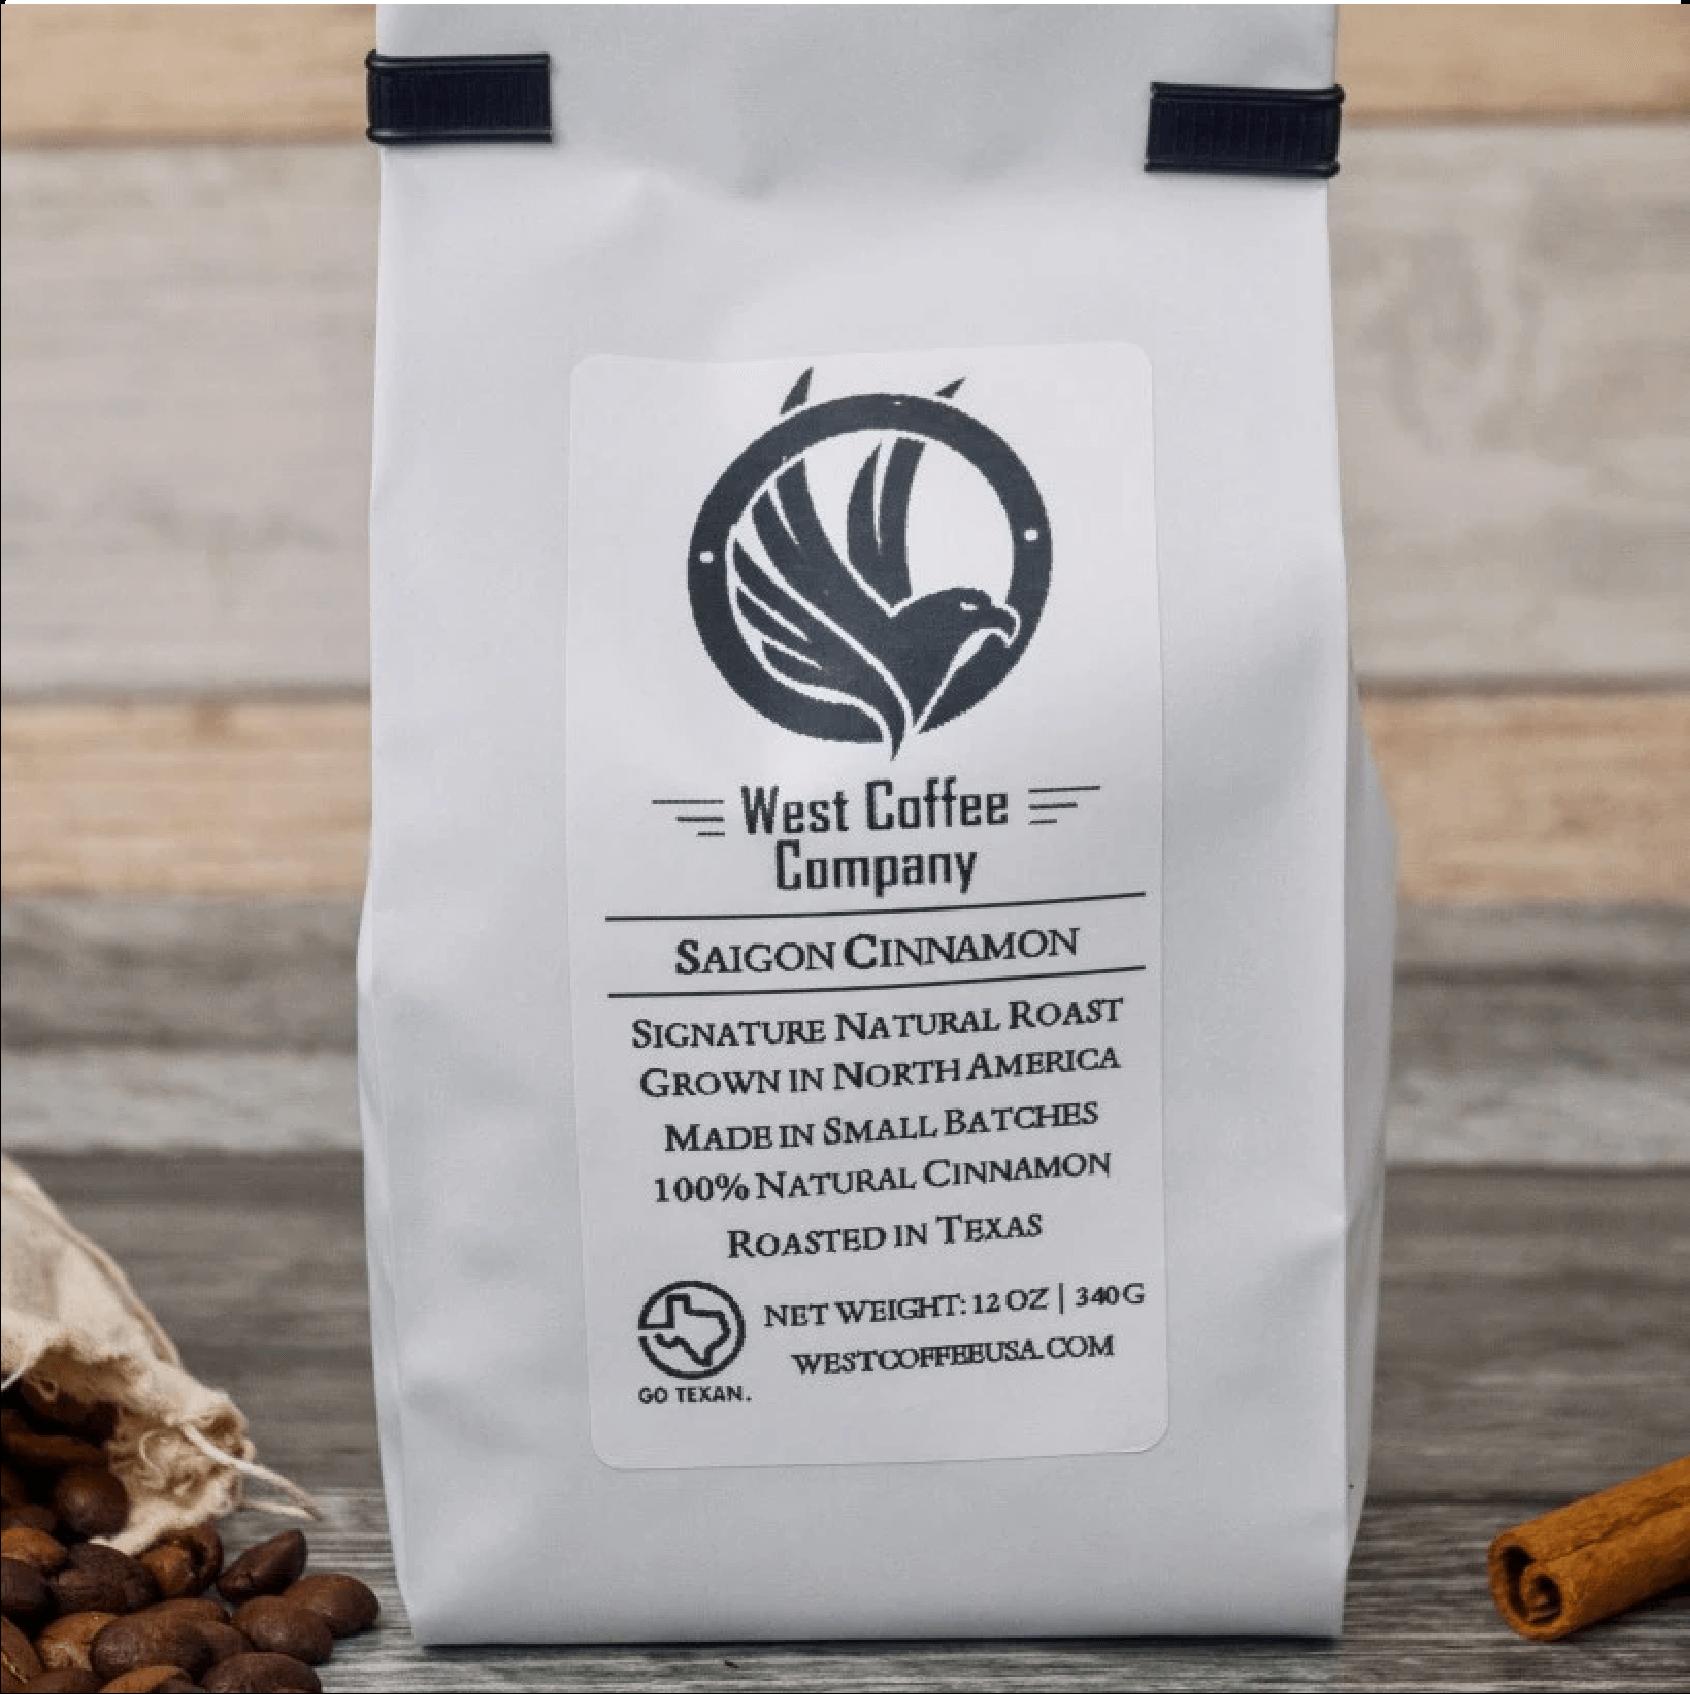 Origin Pack - Saigon Cinnamon (8 oz) from West Coffee Company